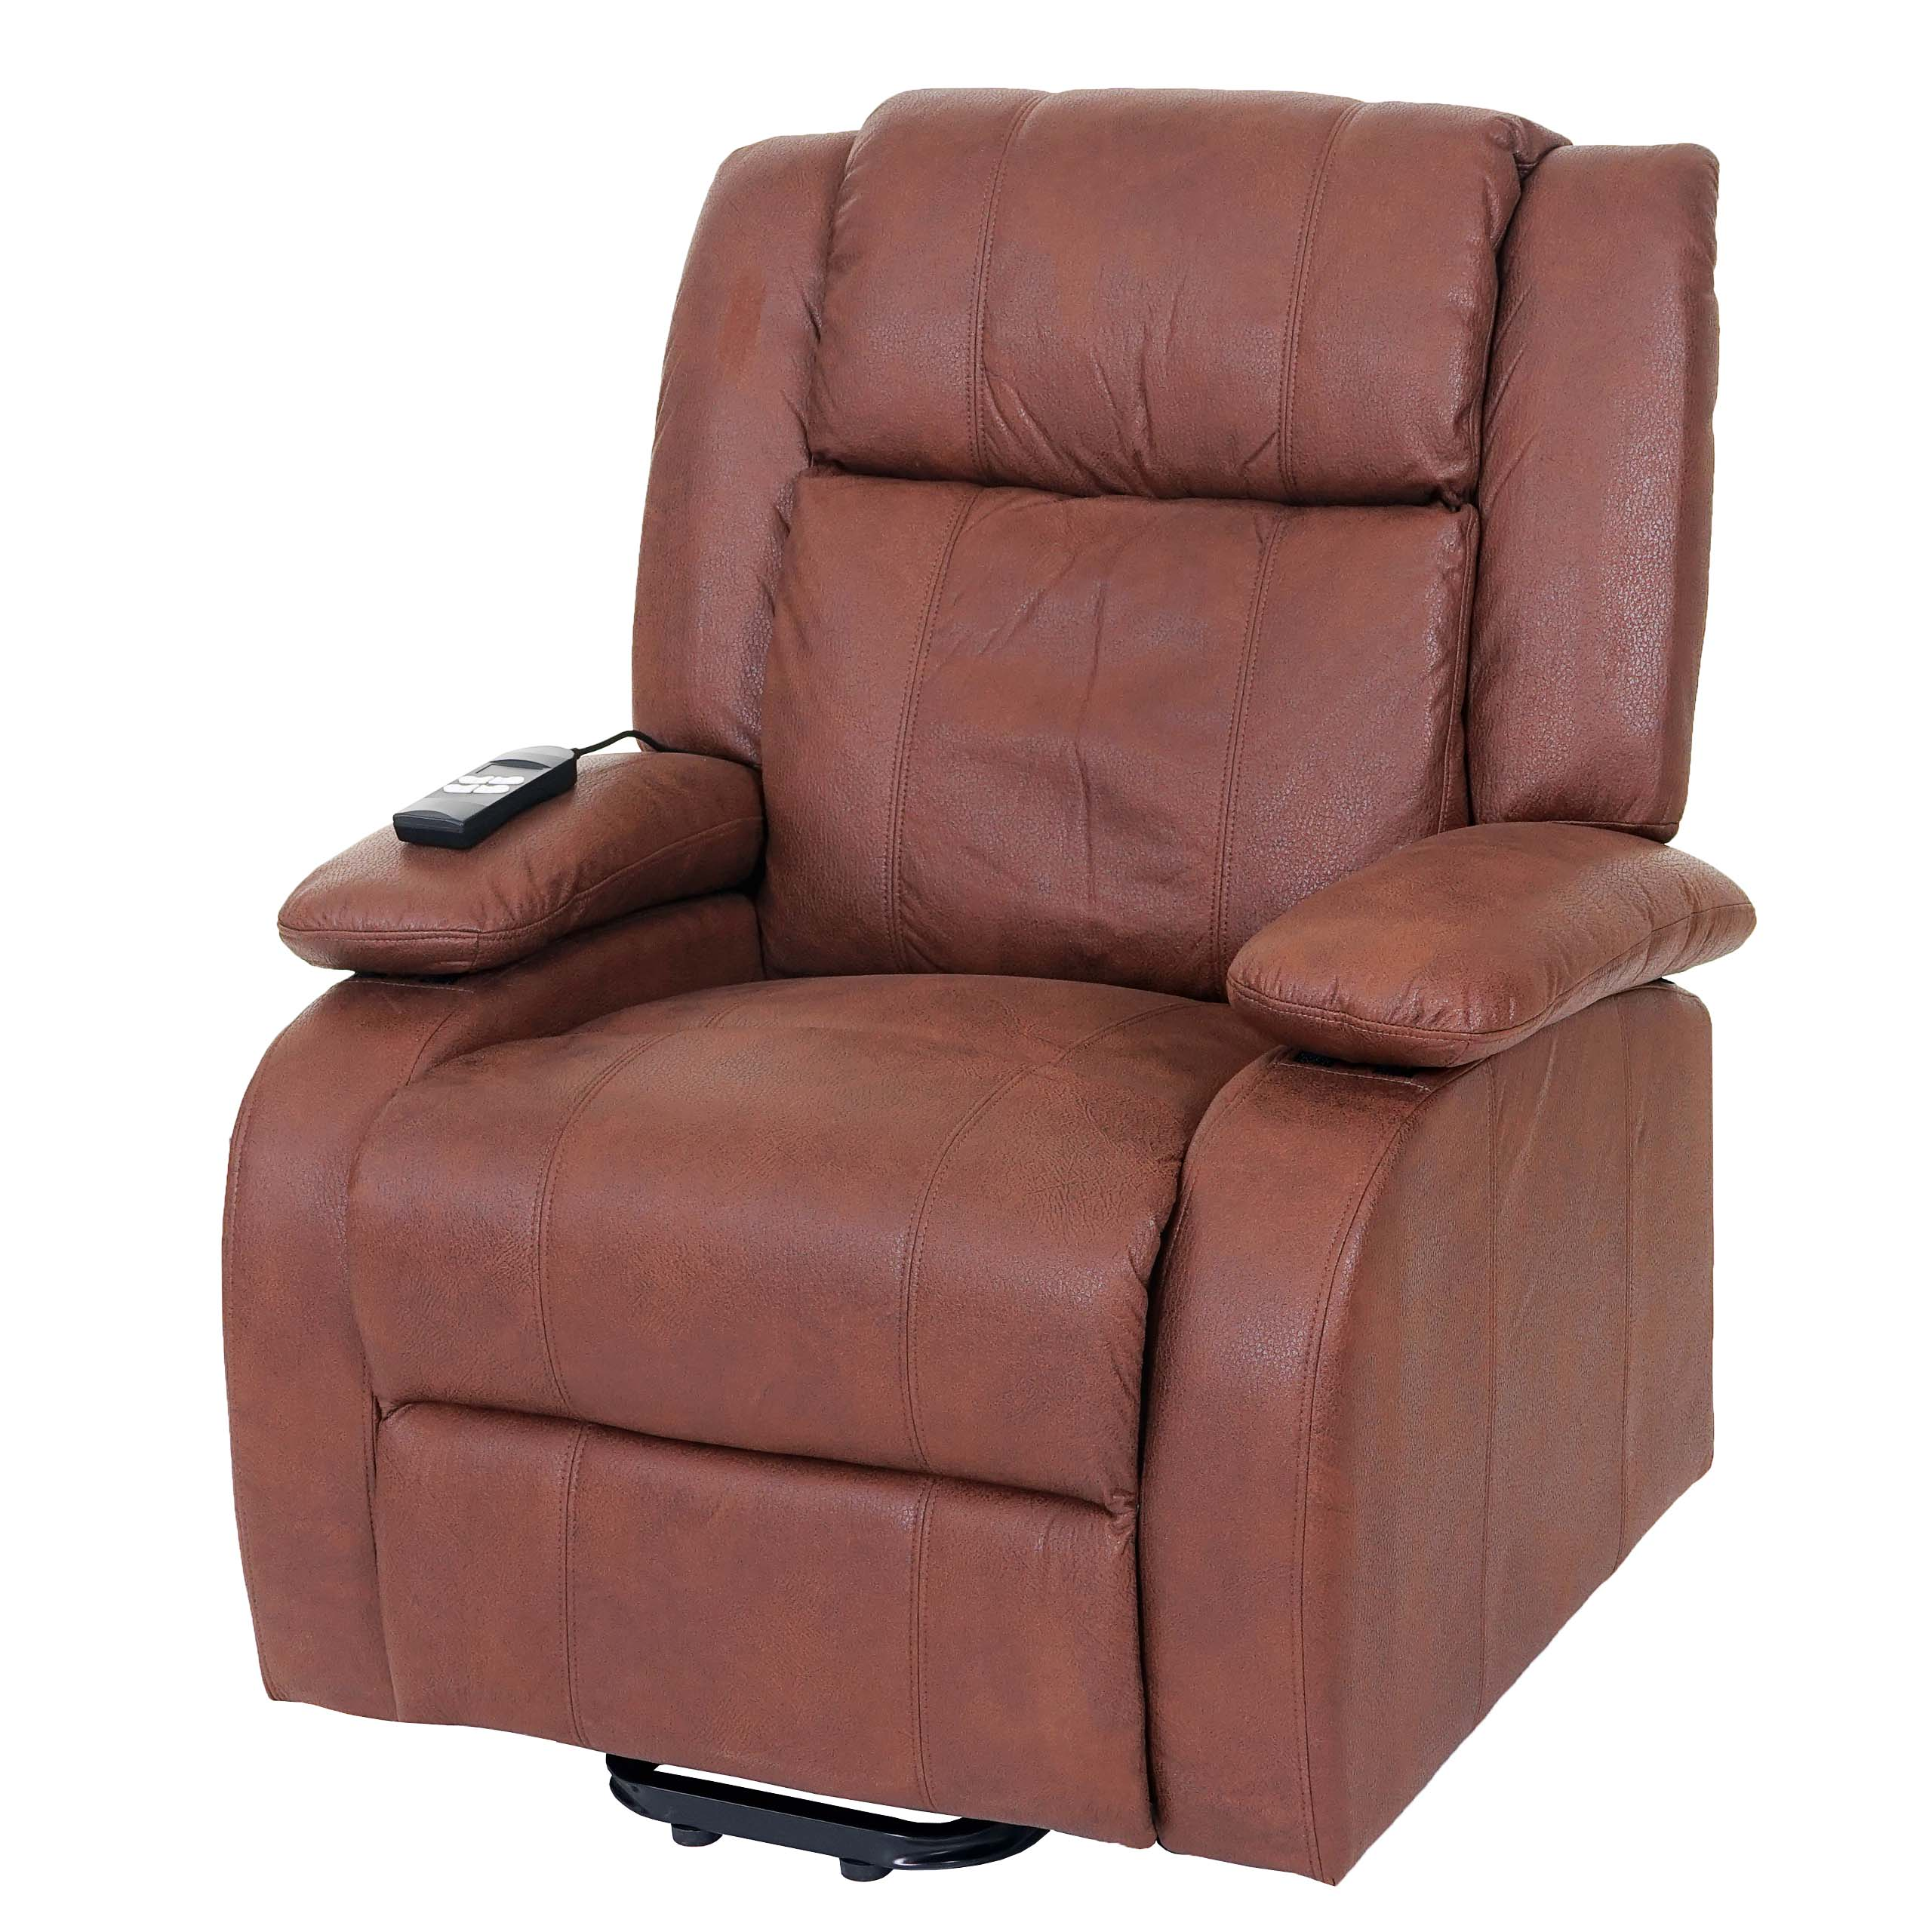 fernsehsessel lincoln relaxsessel 2 motoren aufstehhilfe textil ebay. Black Bedroom Furniture Sets. Home Design Ideas